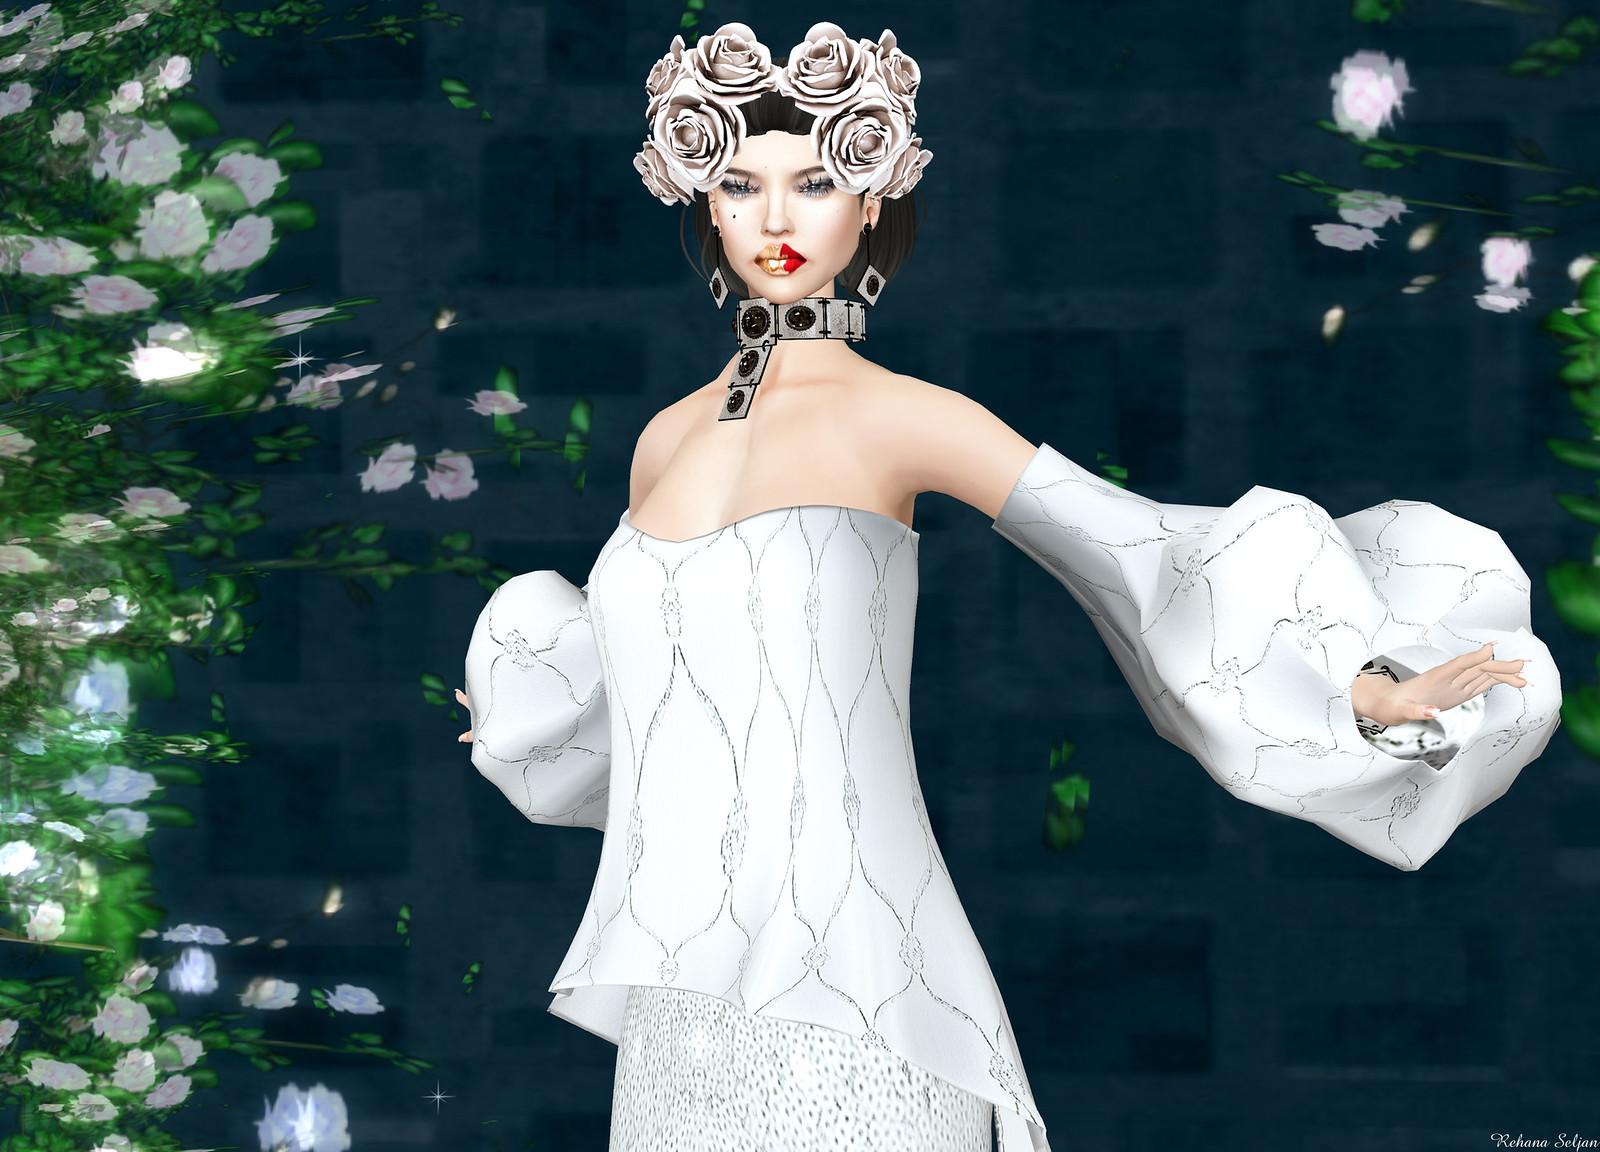 JUMO - Fashion for Ferosh